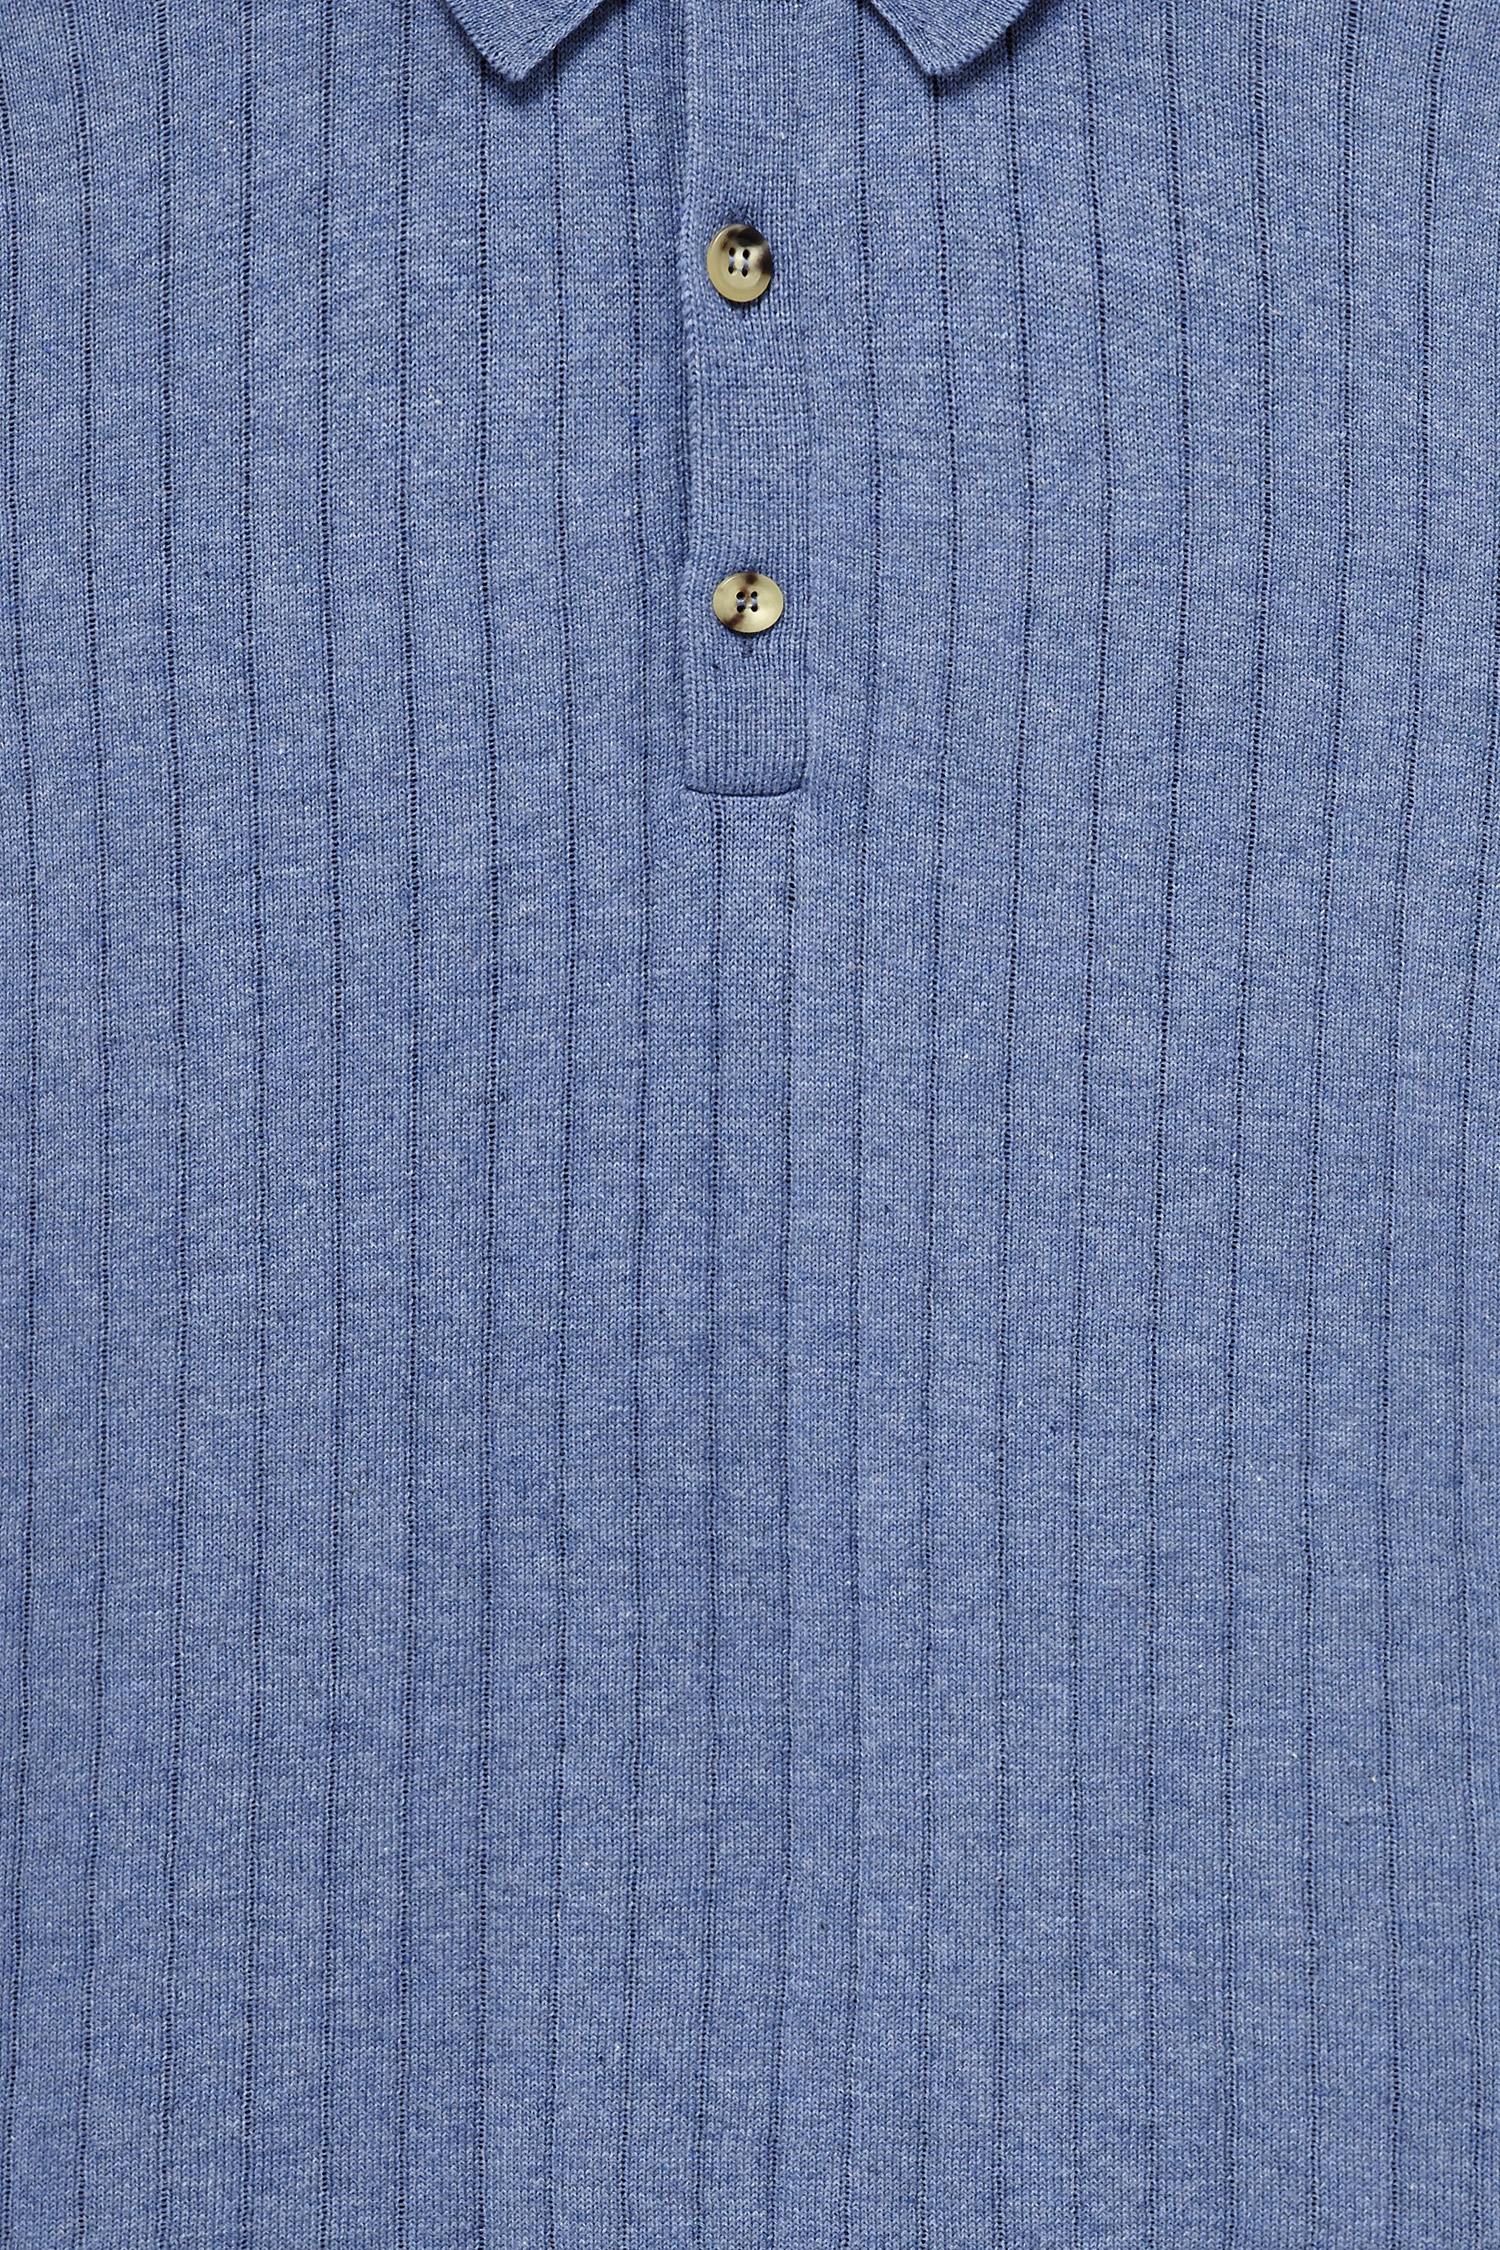 rib-knit-poloS.png